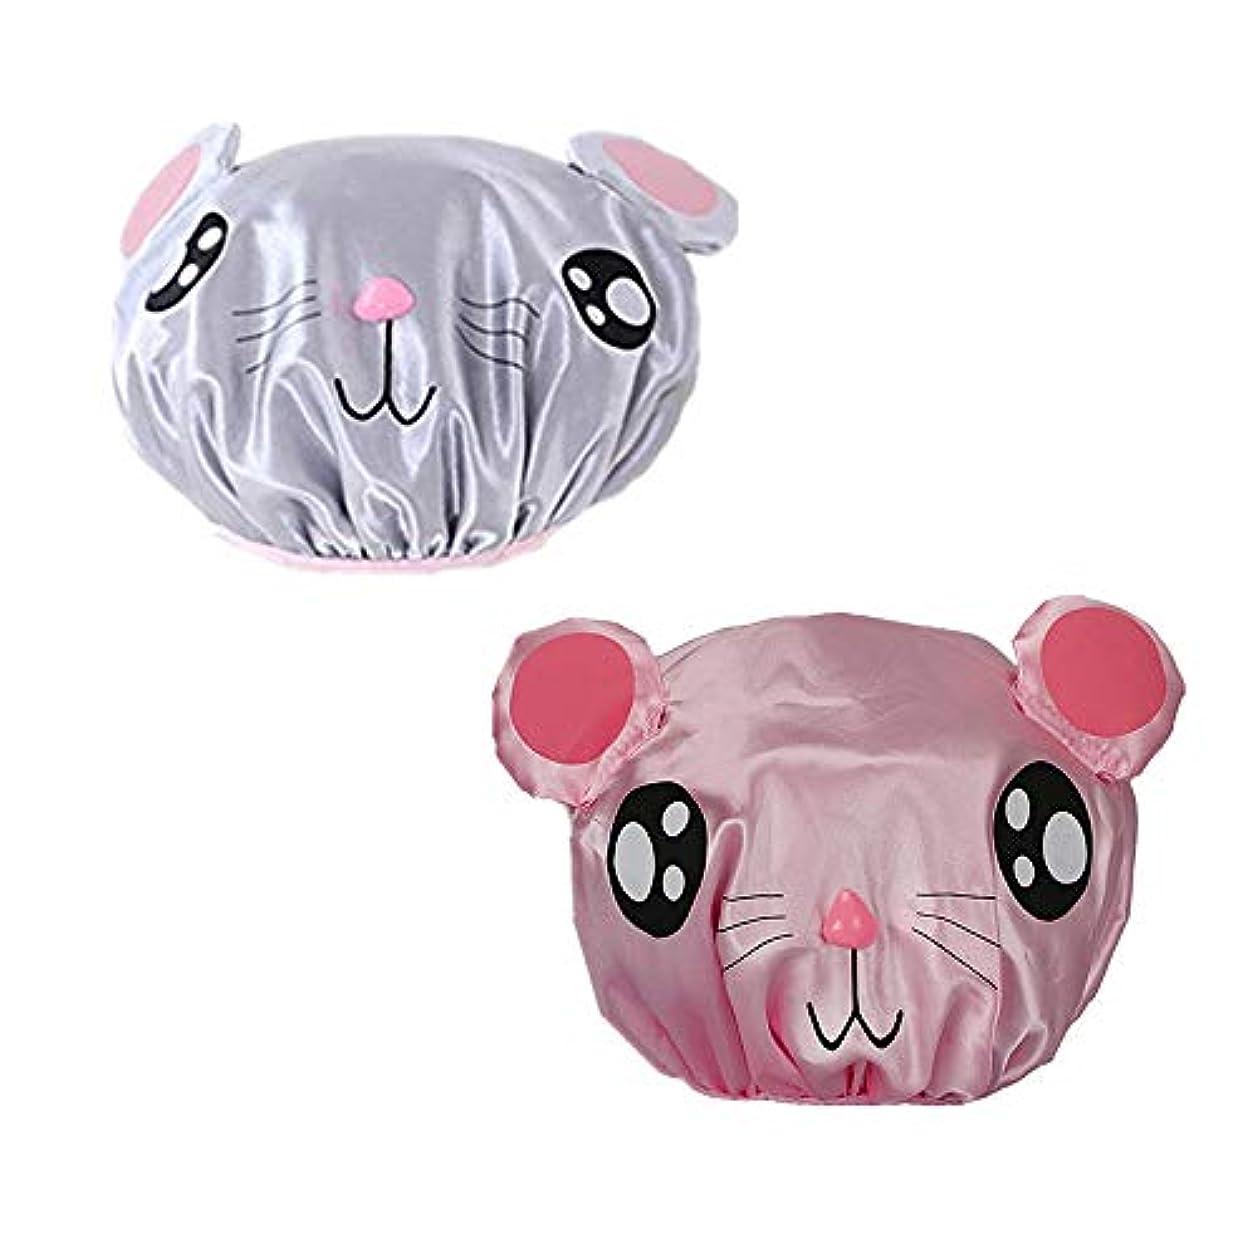 Kingsie シャワーキャップ キッズ 子供用 2枚セット ヘアキャップ 可愛い 動物柄 カートゥーン 防水帽 入浴キャップ お風呂 ピンク/グレー